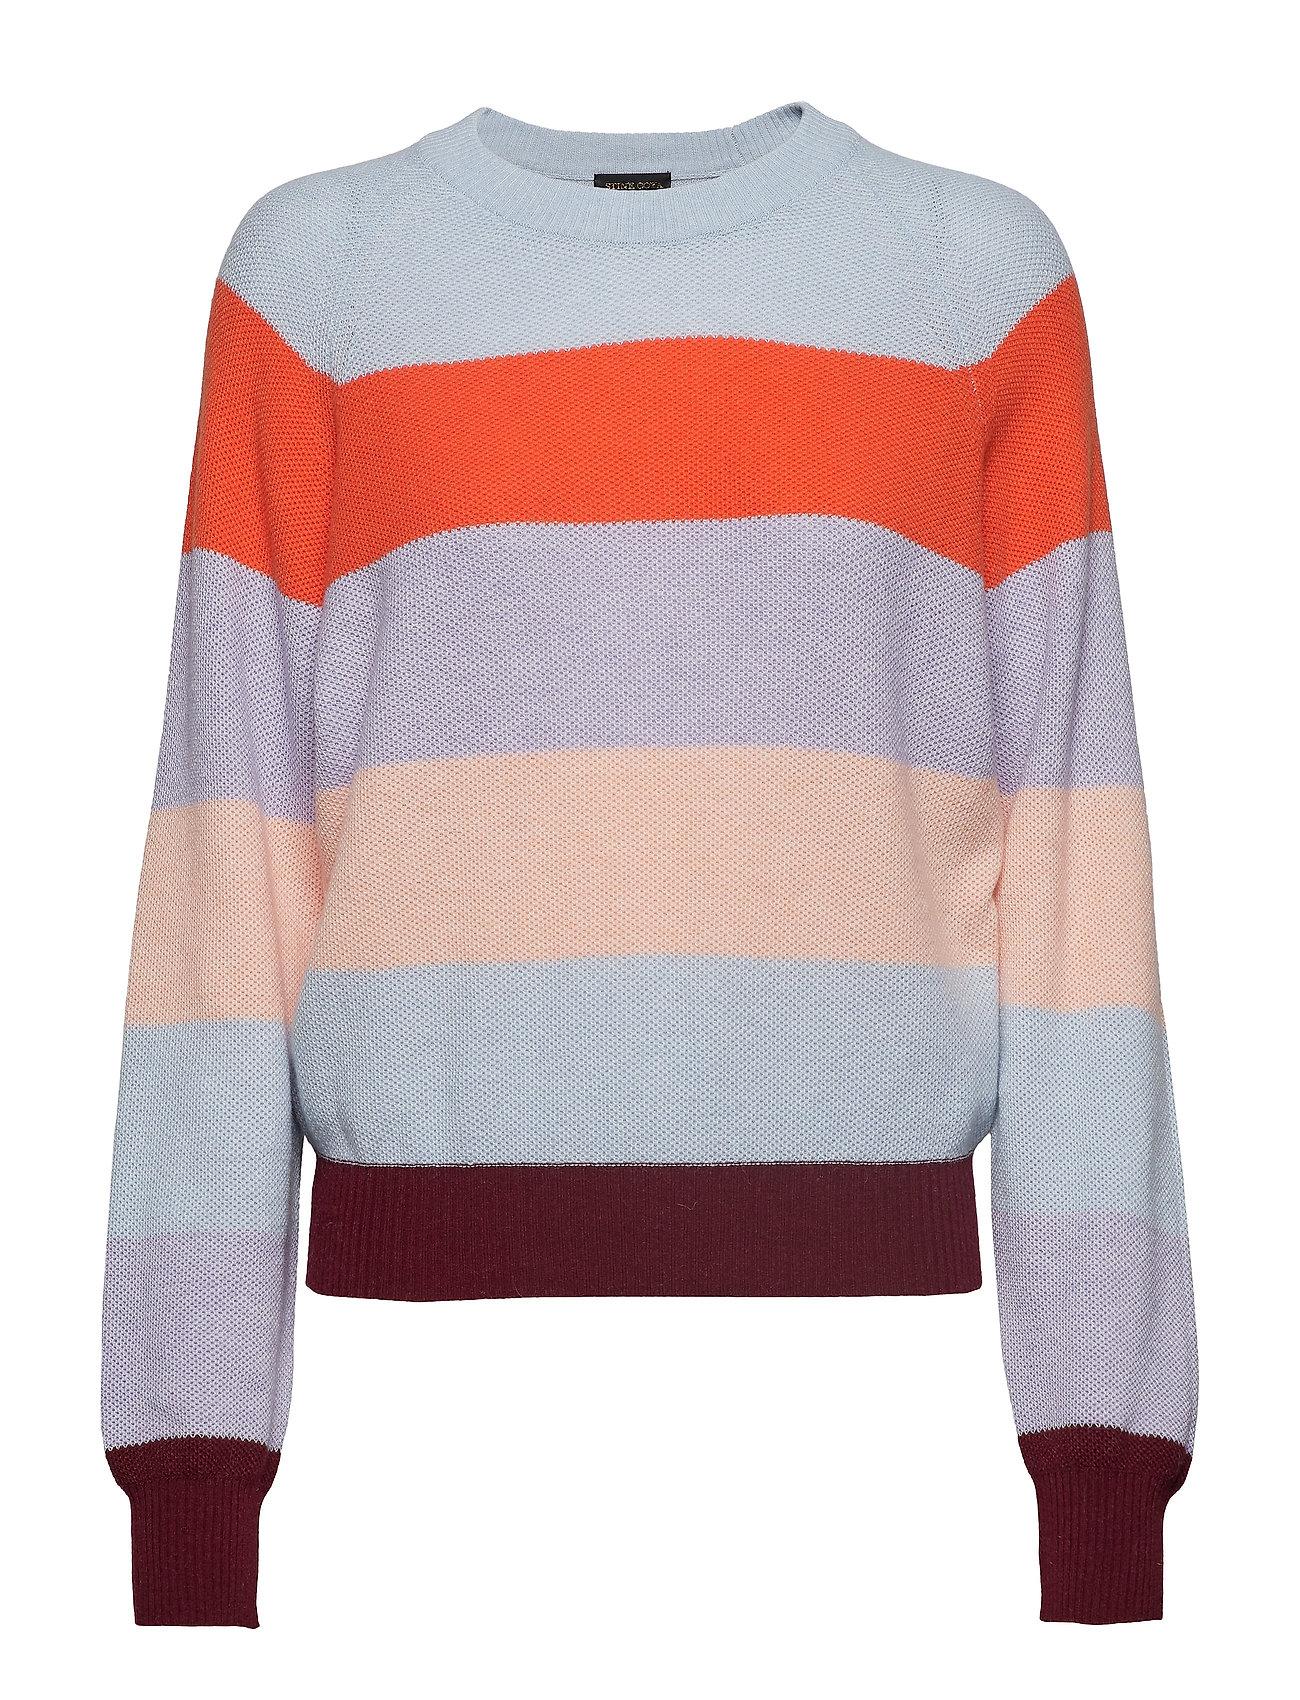 STINE GOYA Magdalena, 584 Stripes Knitwear